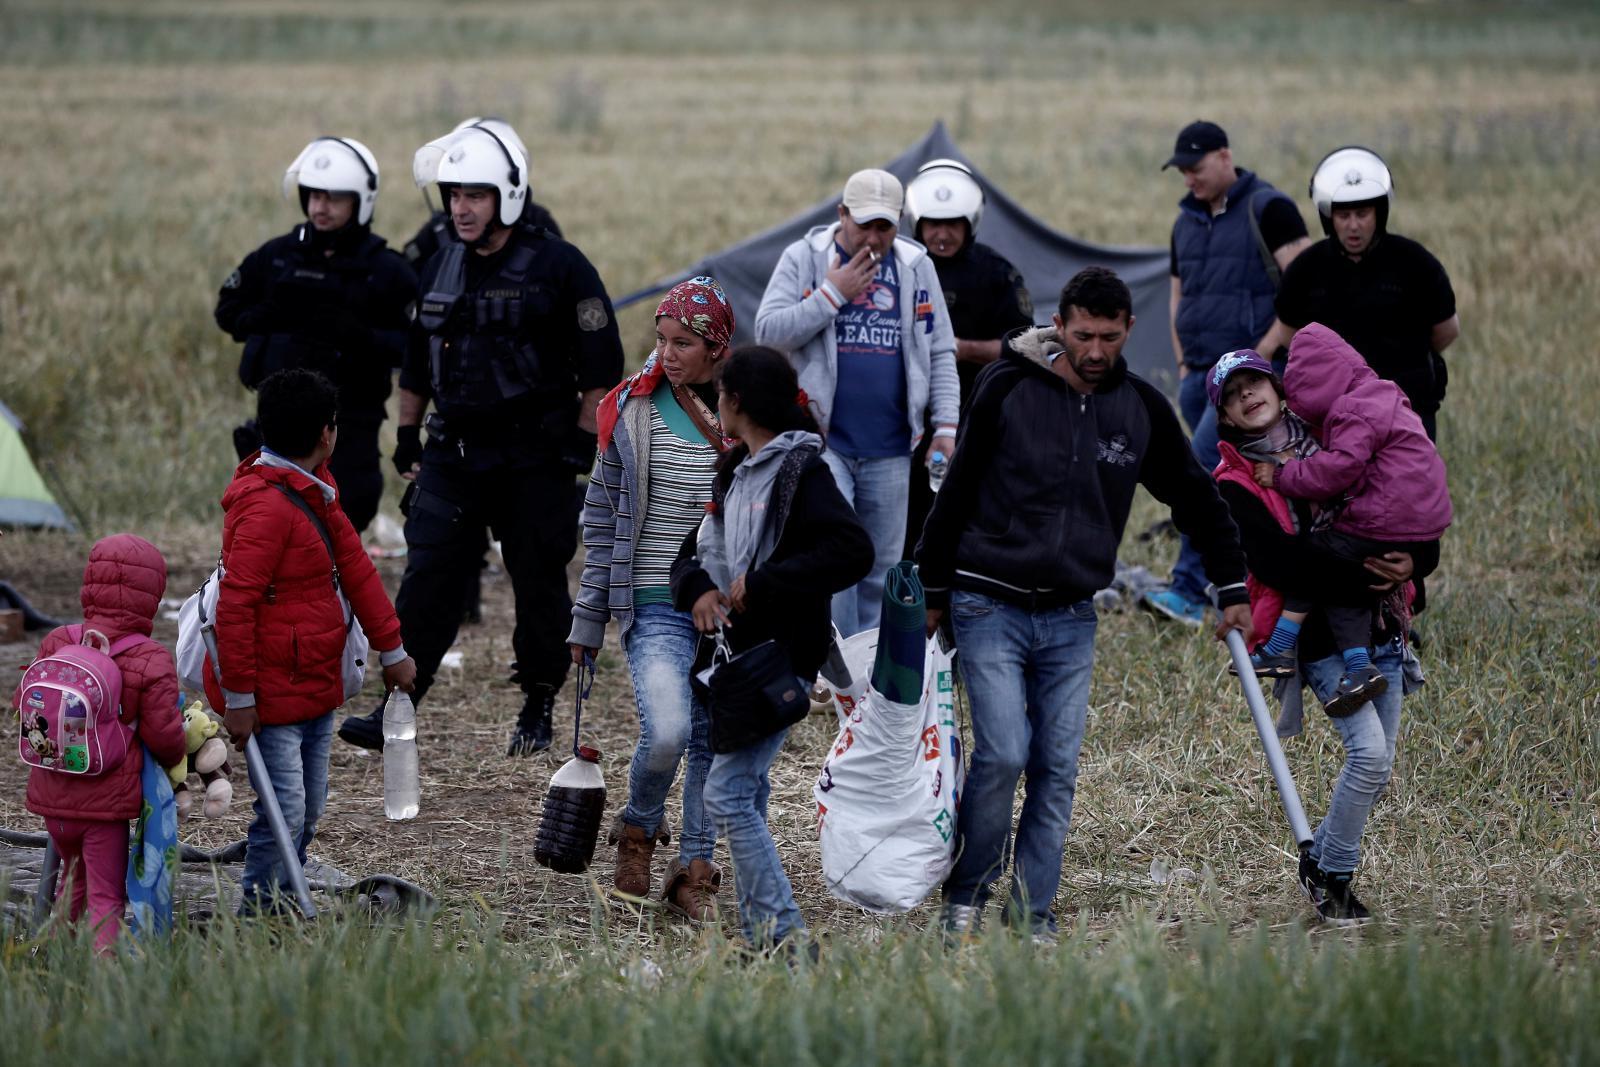 Evakuace uprchlického tábora u Idomeni